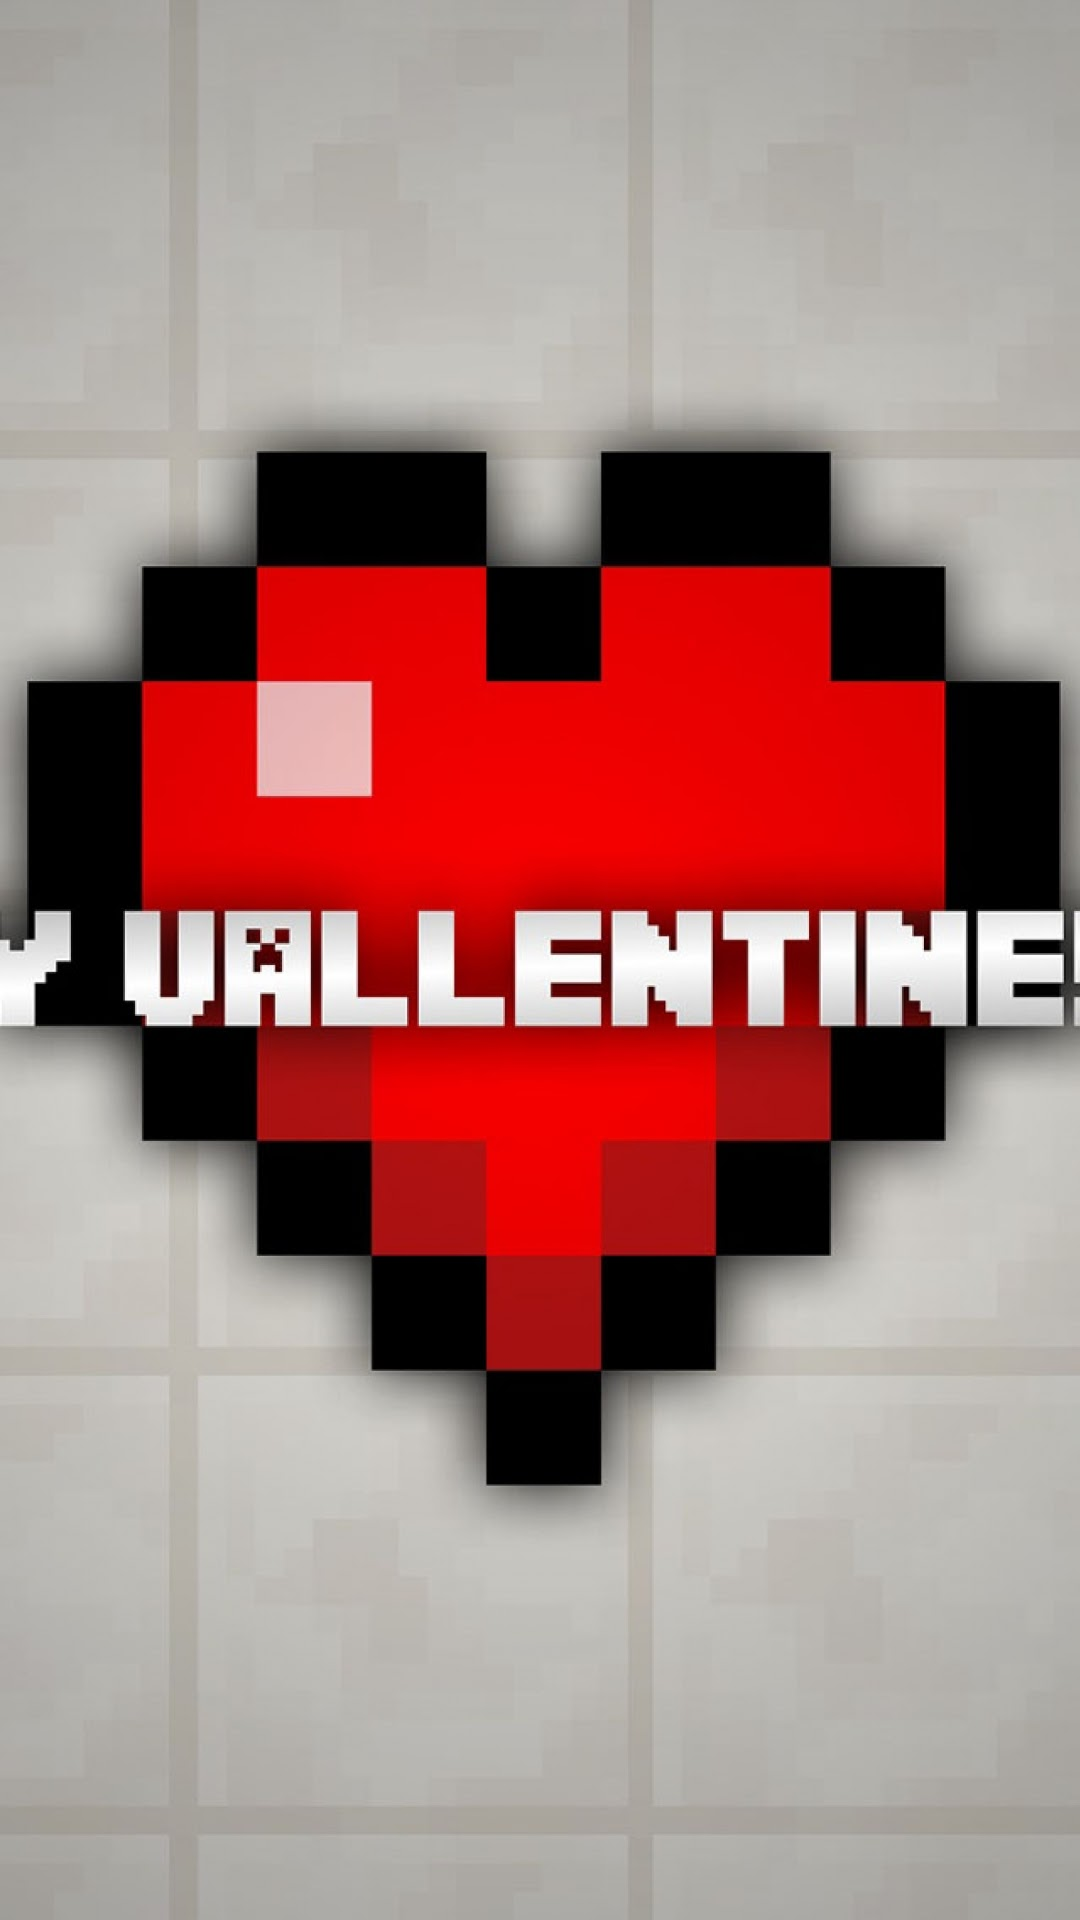 Best Wallpaper Minecraft Galaxy - minecraft-happy-valentine-8217-s-day-galaxy-note-hd-wallpaper  Perfect Image Reference_105156.jpg